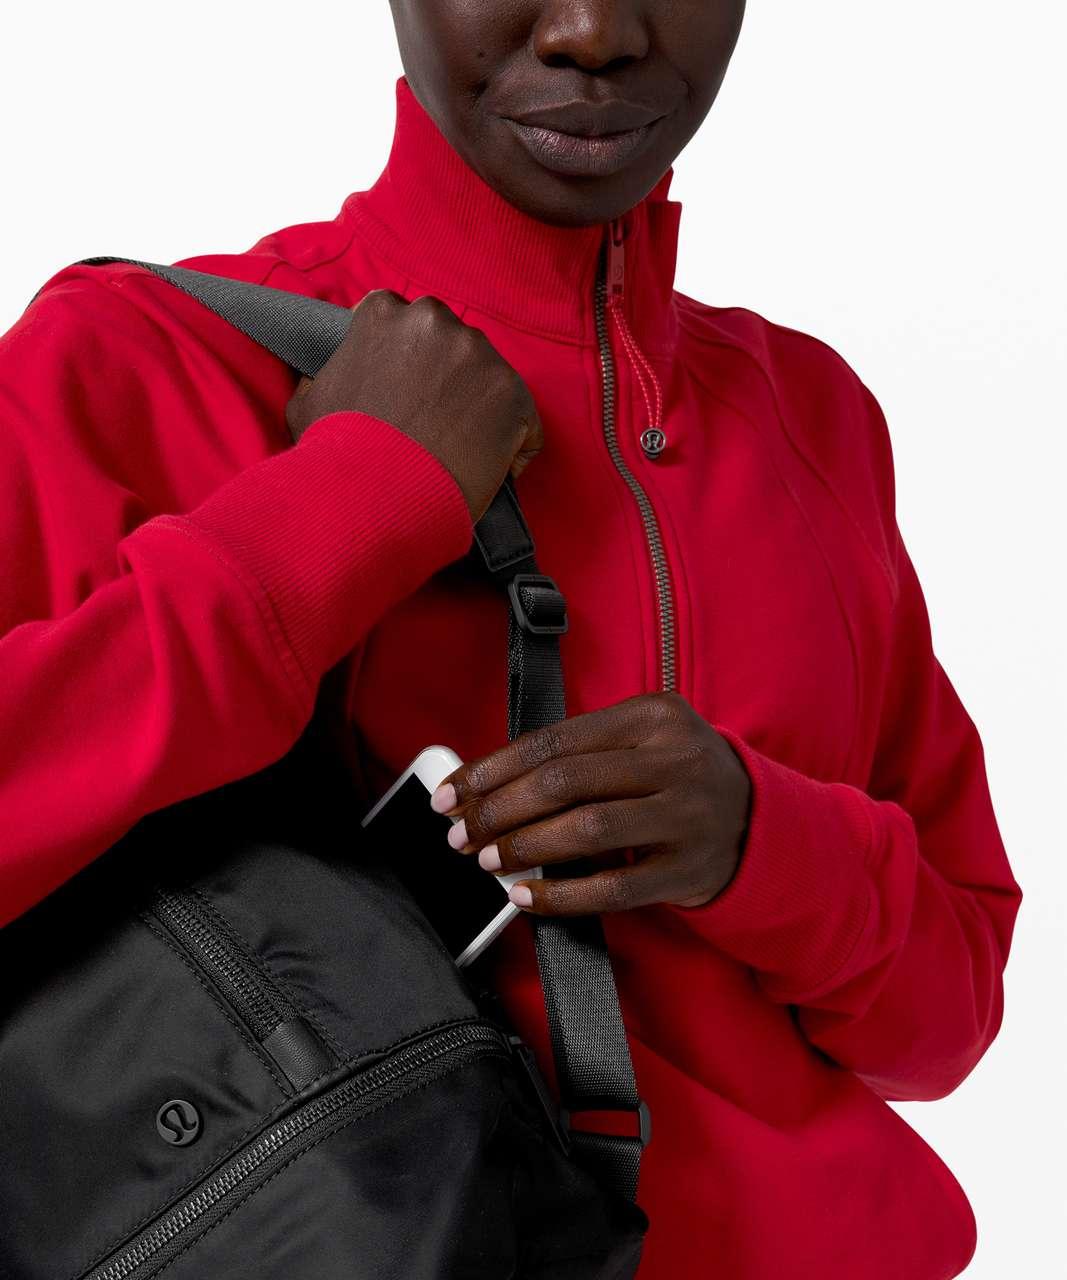 Lululemon City Adventurer Backpack Mini *10L - Black